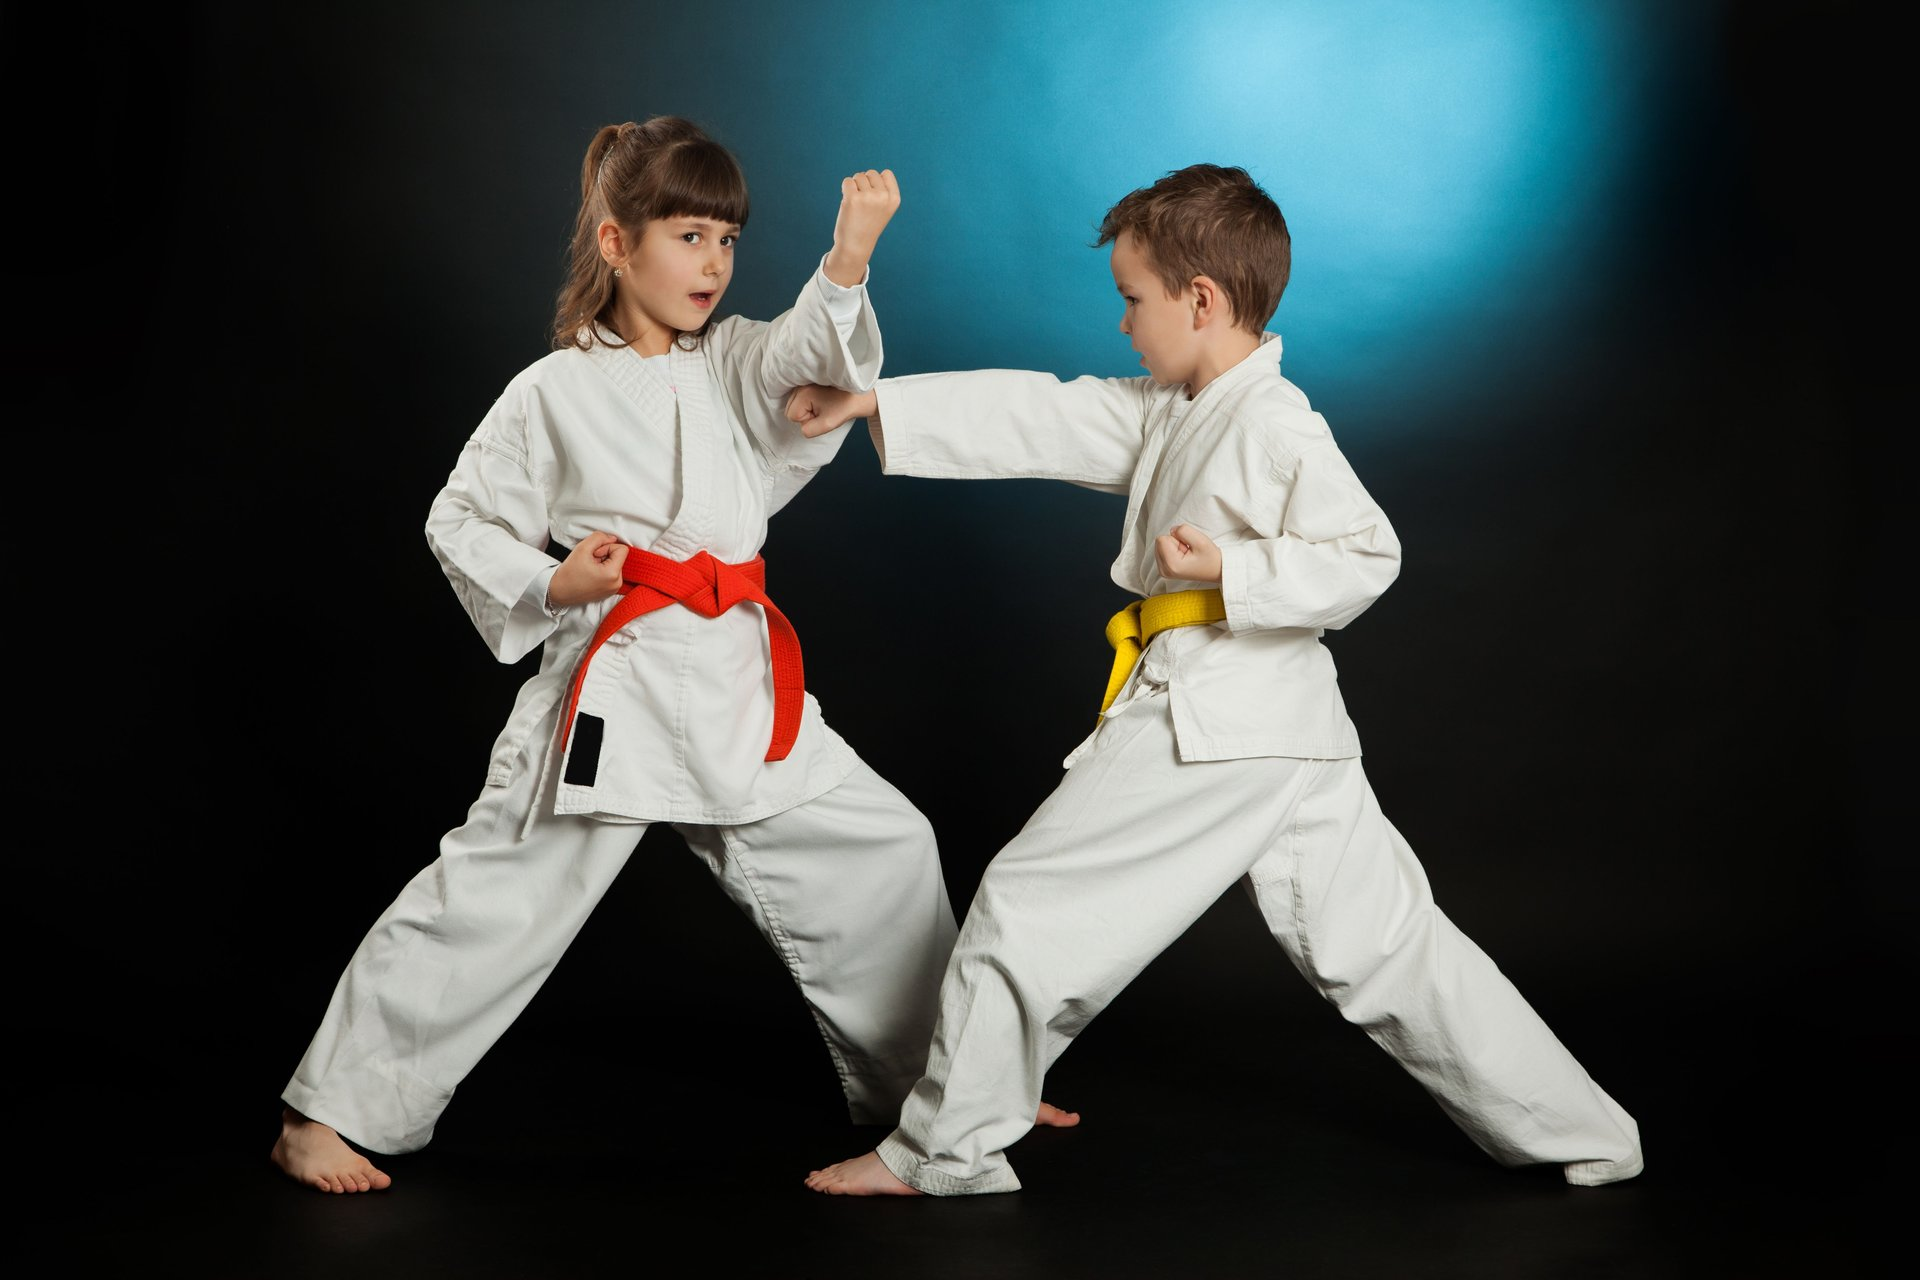 Watch Martial arts video